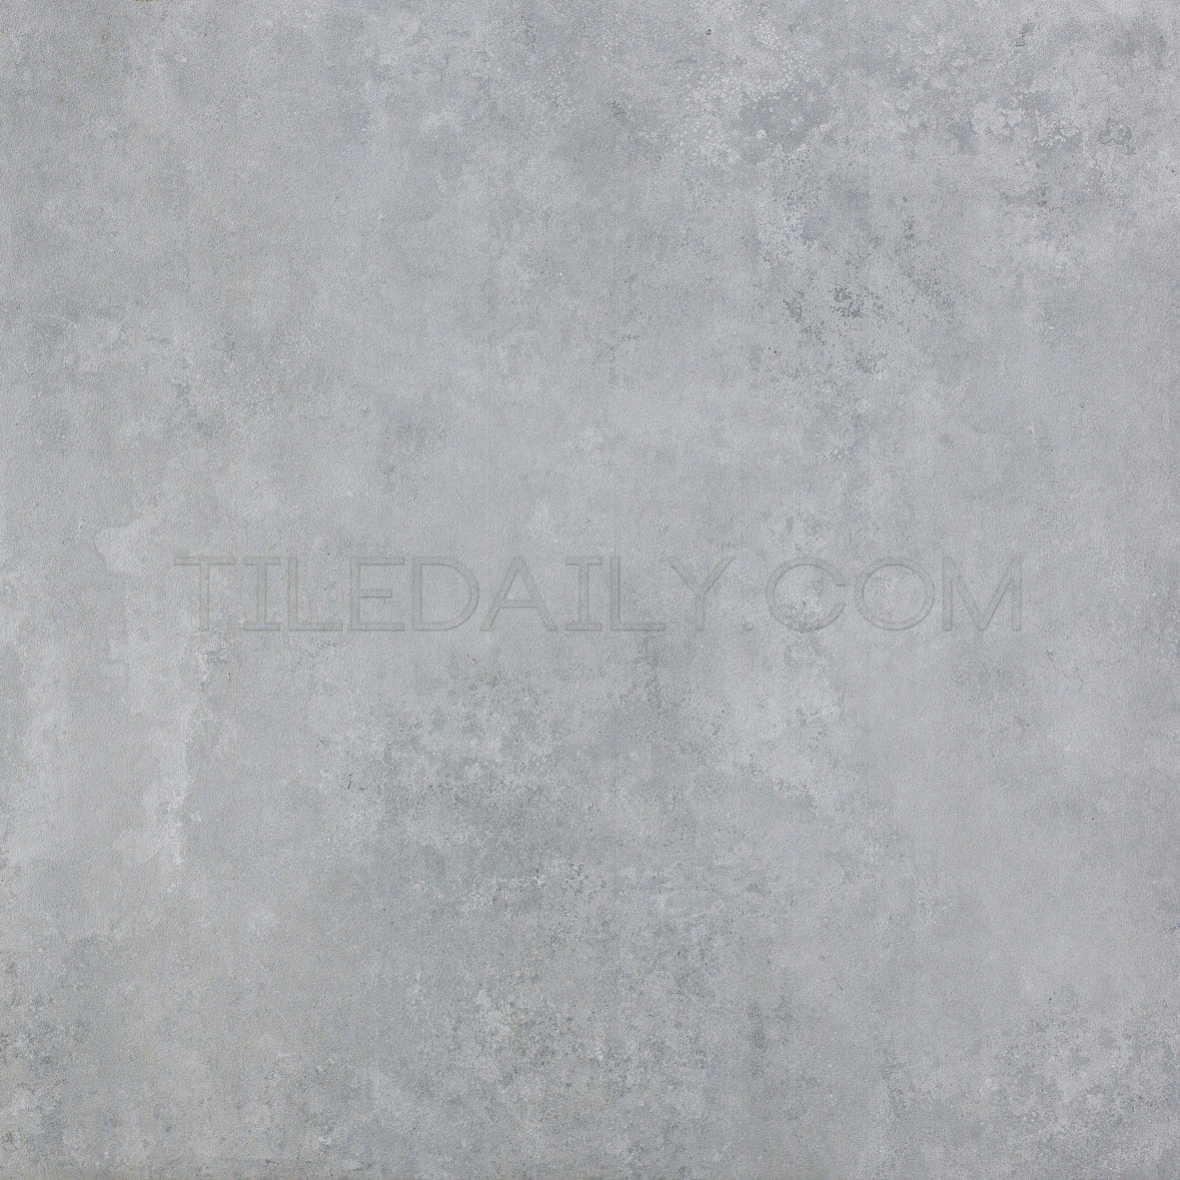 24x24 Cement Series Porcelain Tile, Light Grey at TileDaily